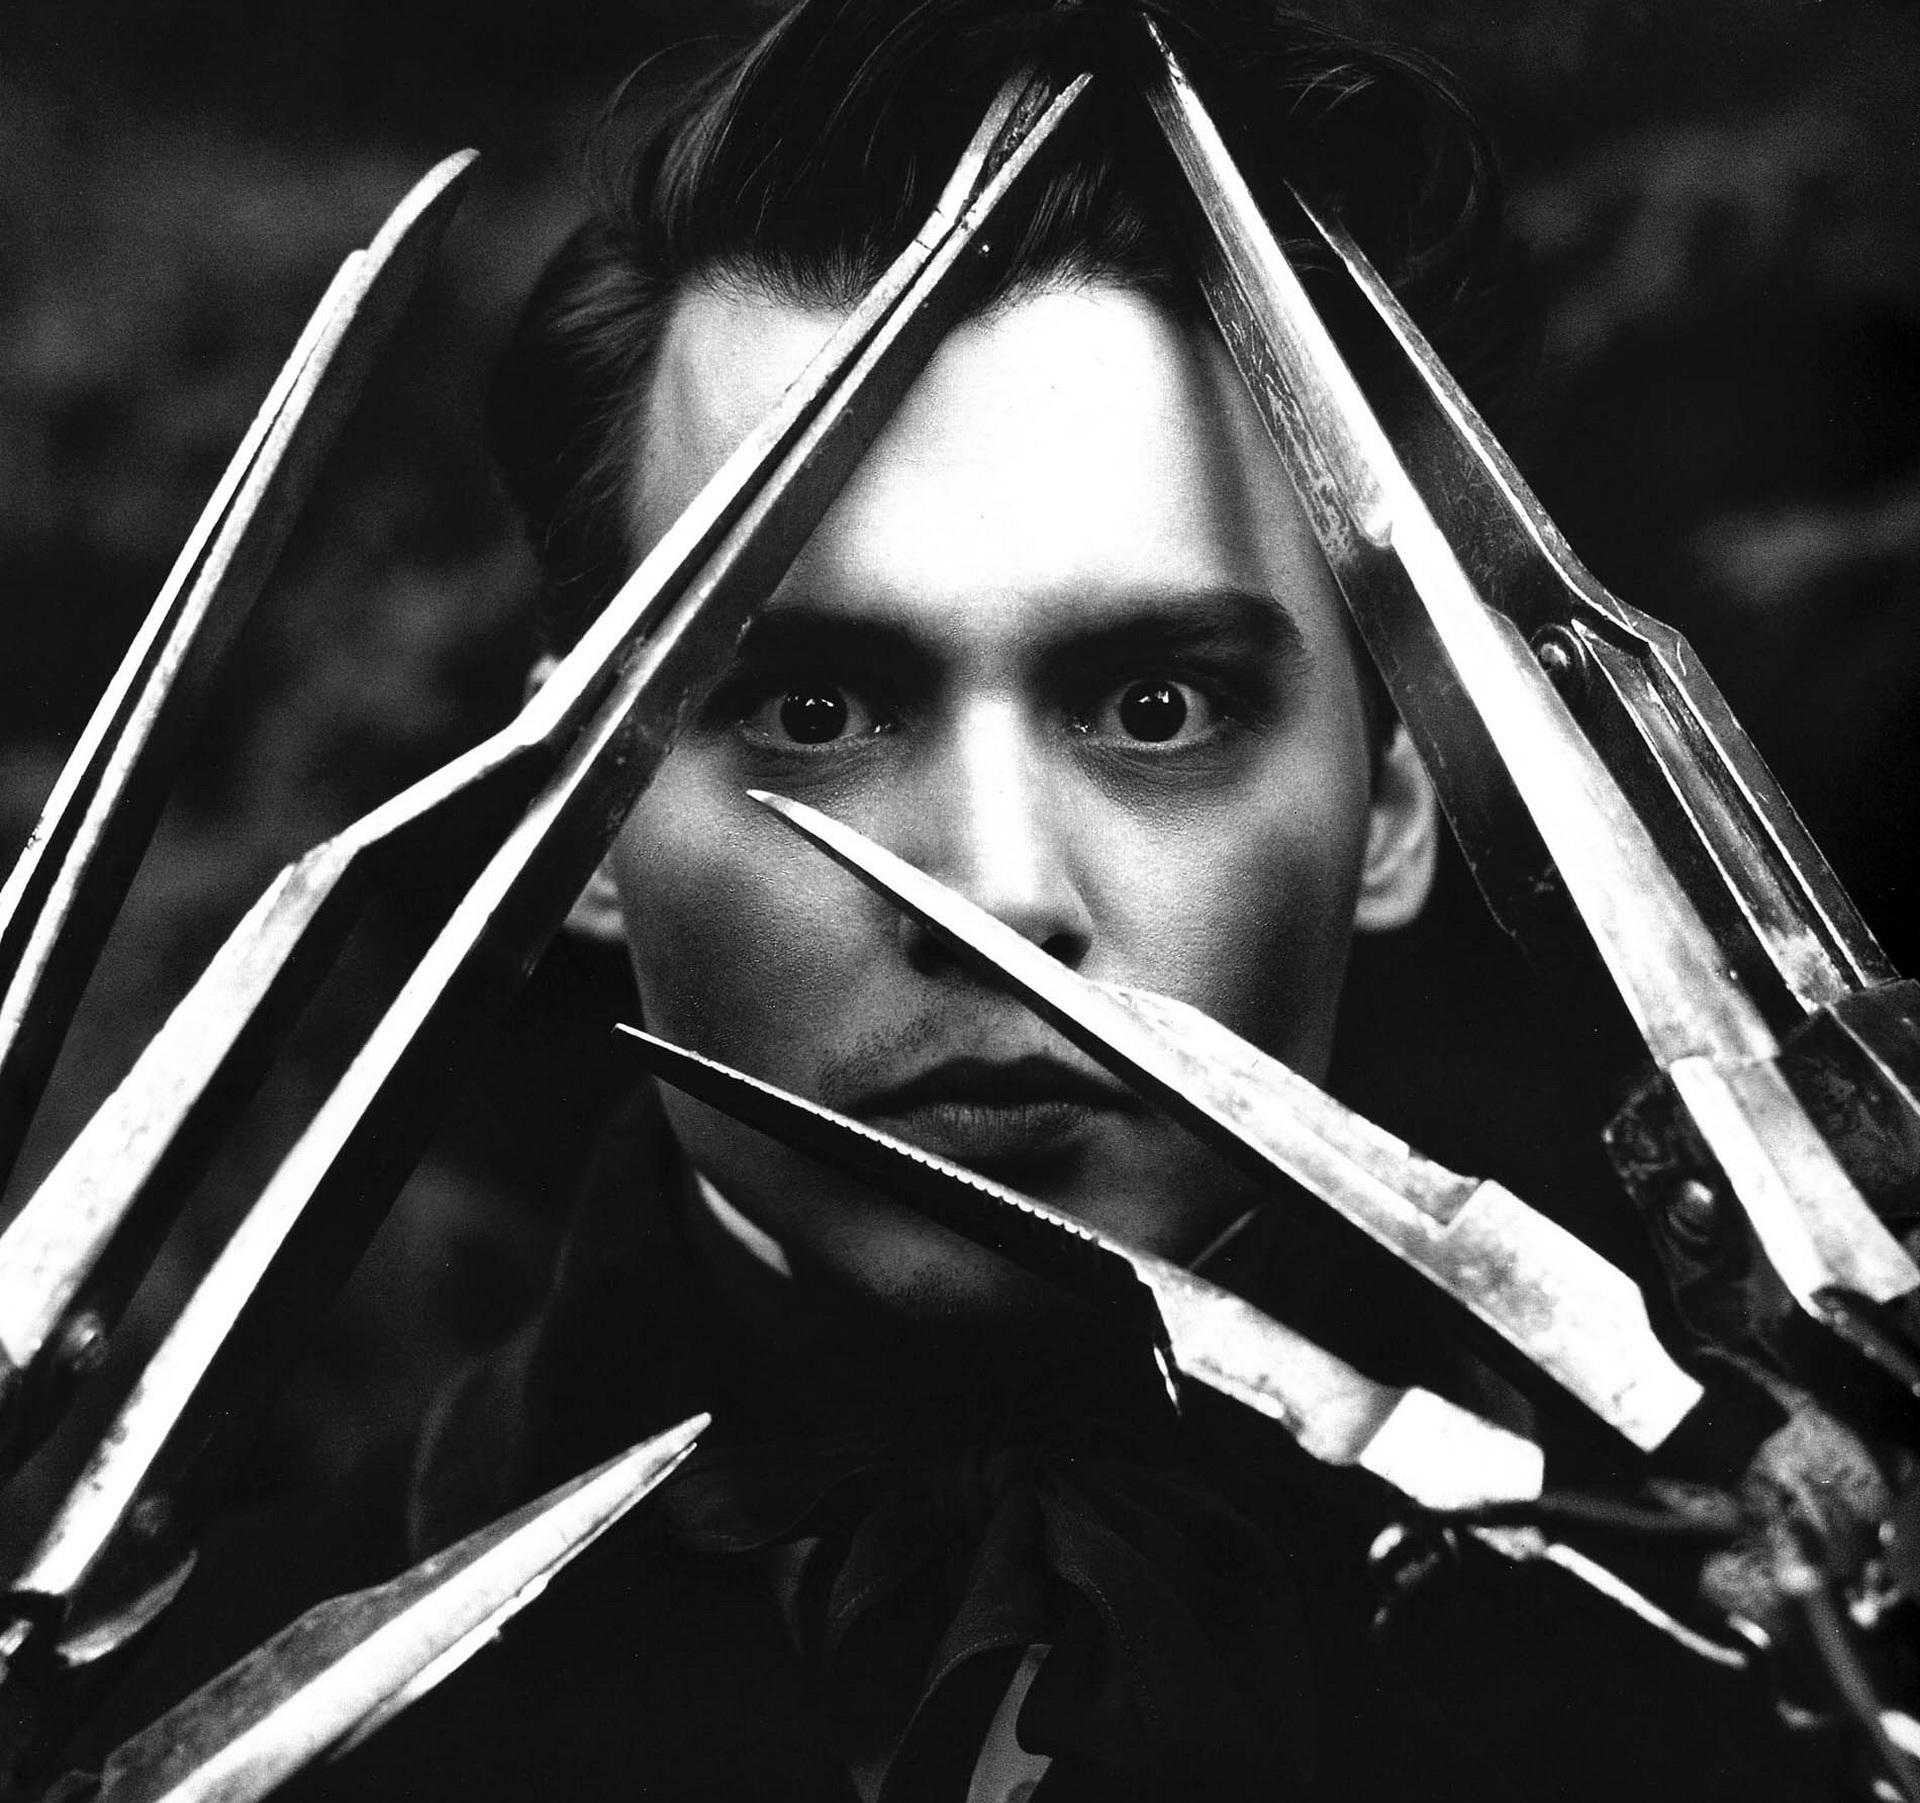 эдвард руки ножниц картинки реале выглядим ведем